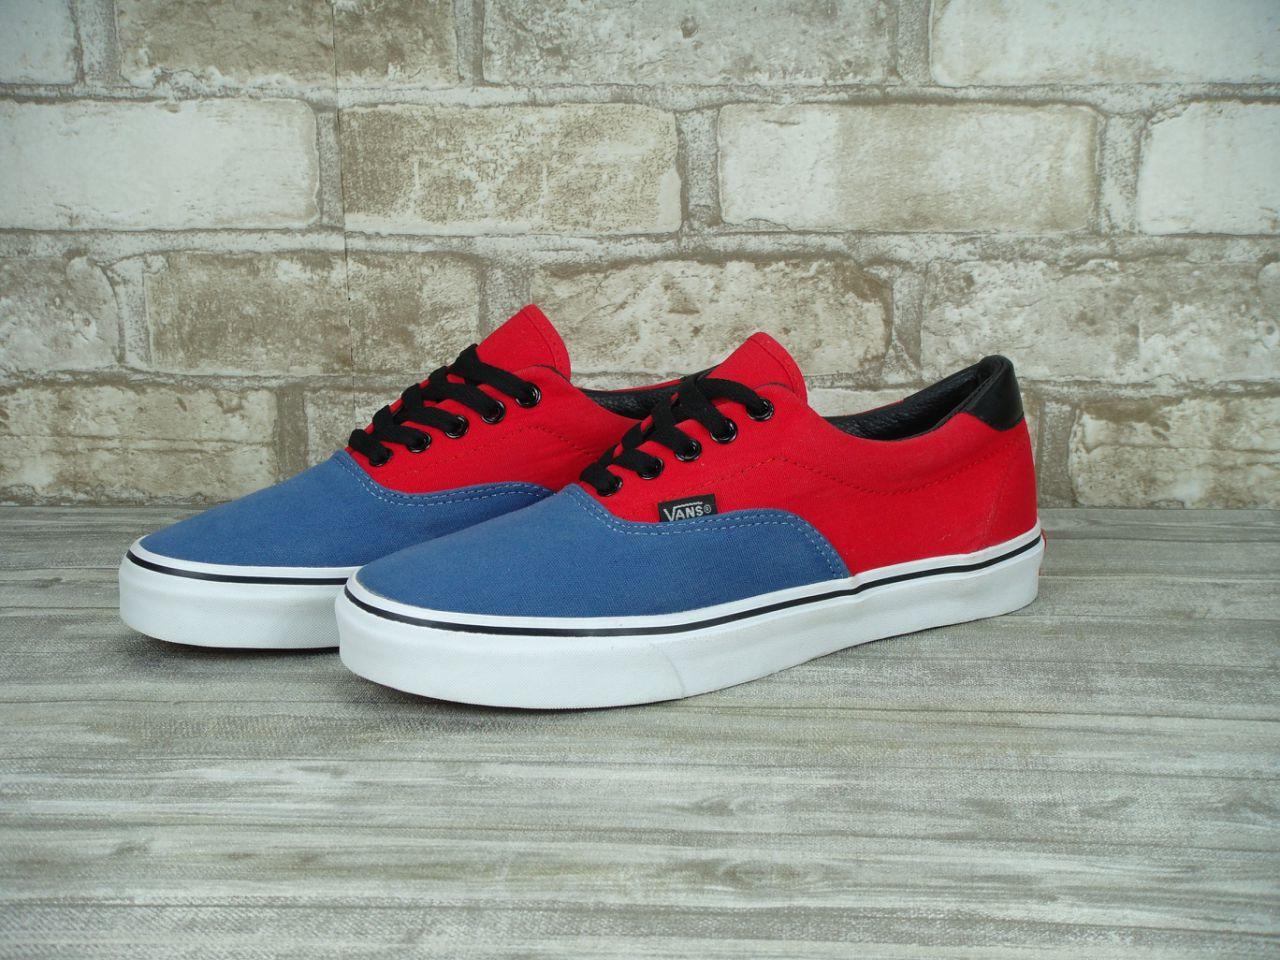 Кеды Vans Authentic Red Blue White Sole - Интернет-магазин «Reverie Shoes 9965abce174